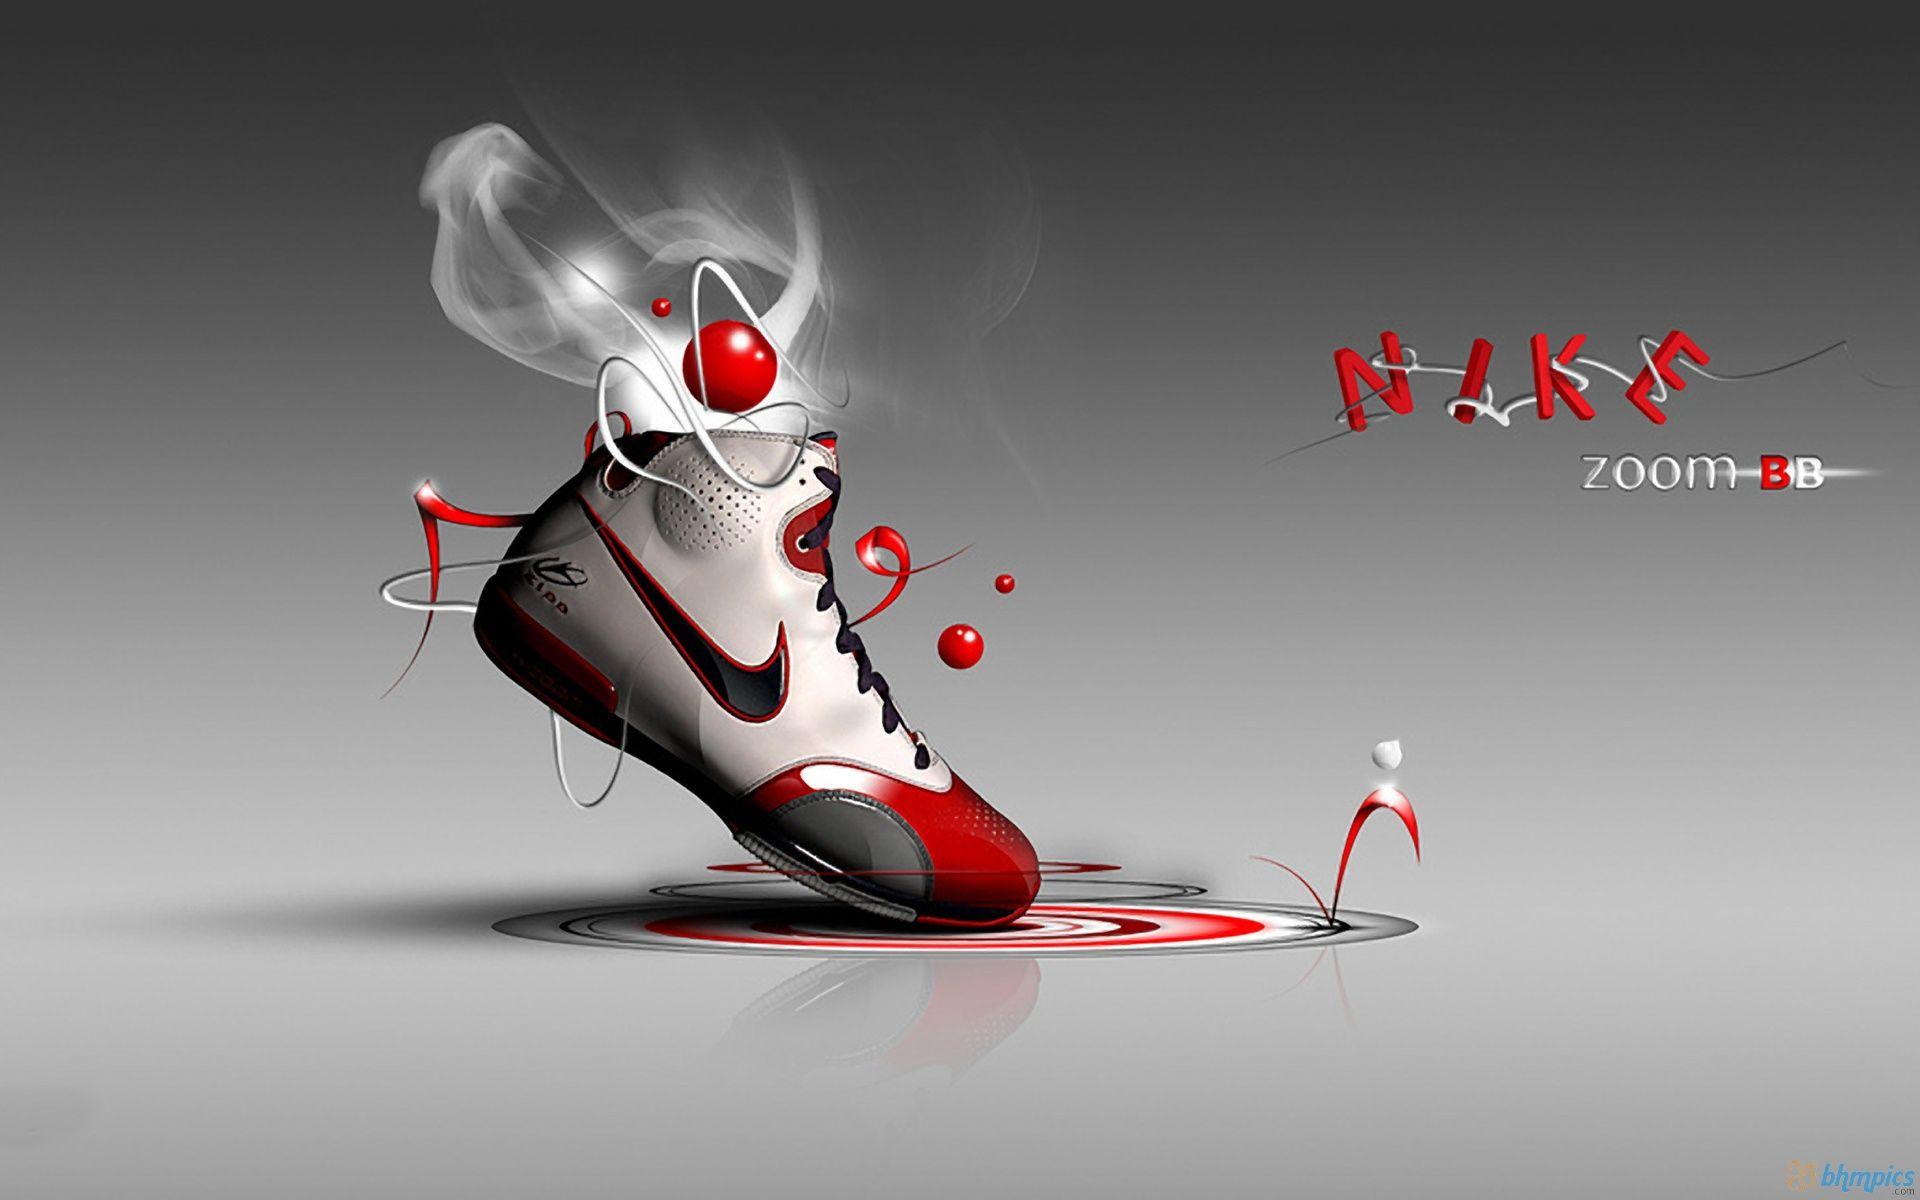 NIKE Sneaker Zoom BB Hd wallpapers for laptop, Nike